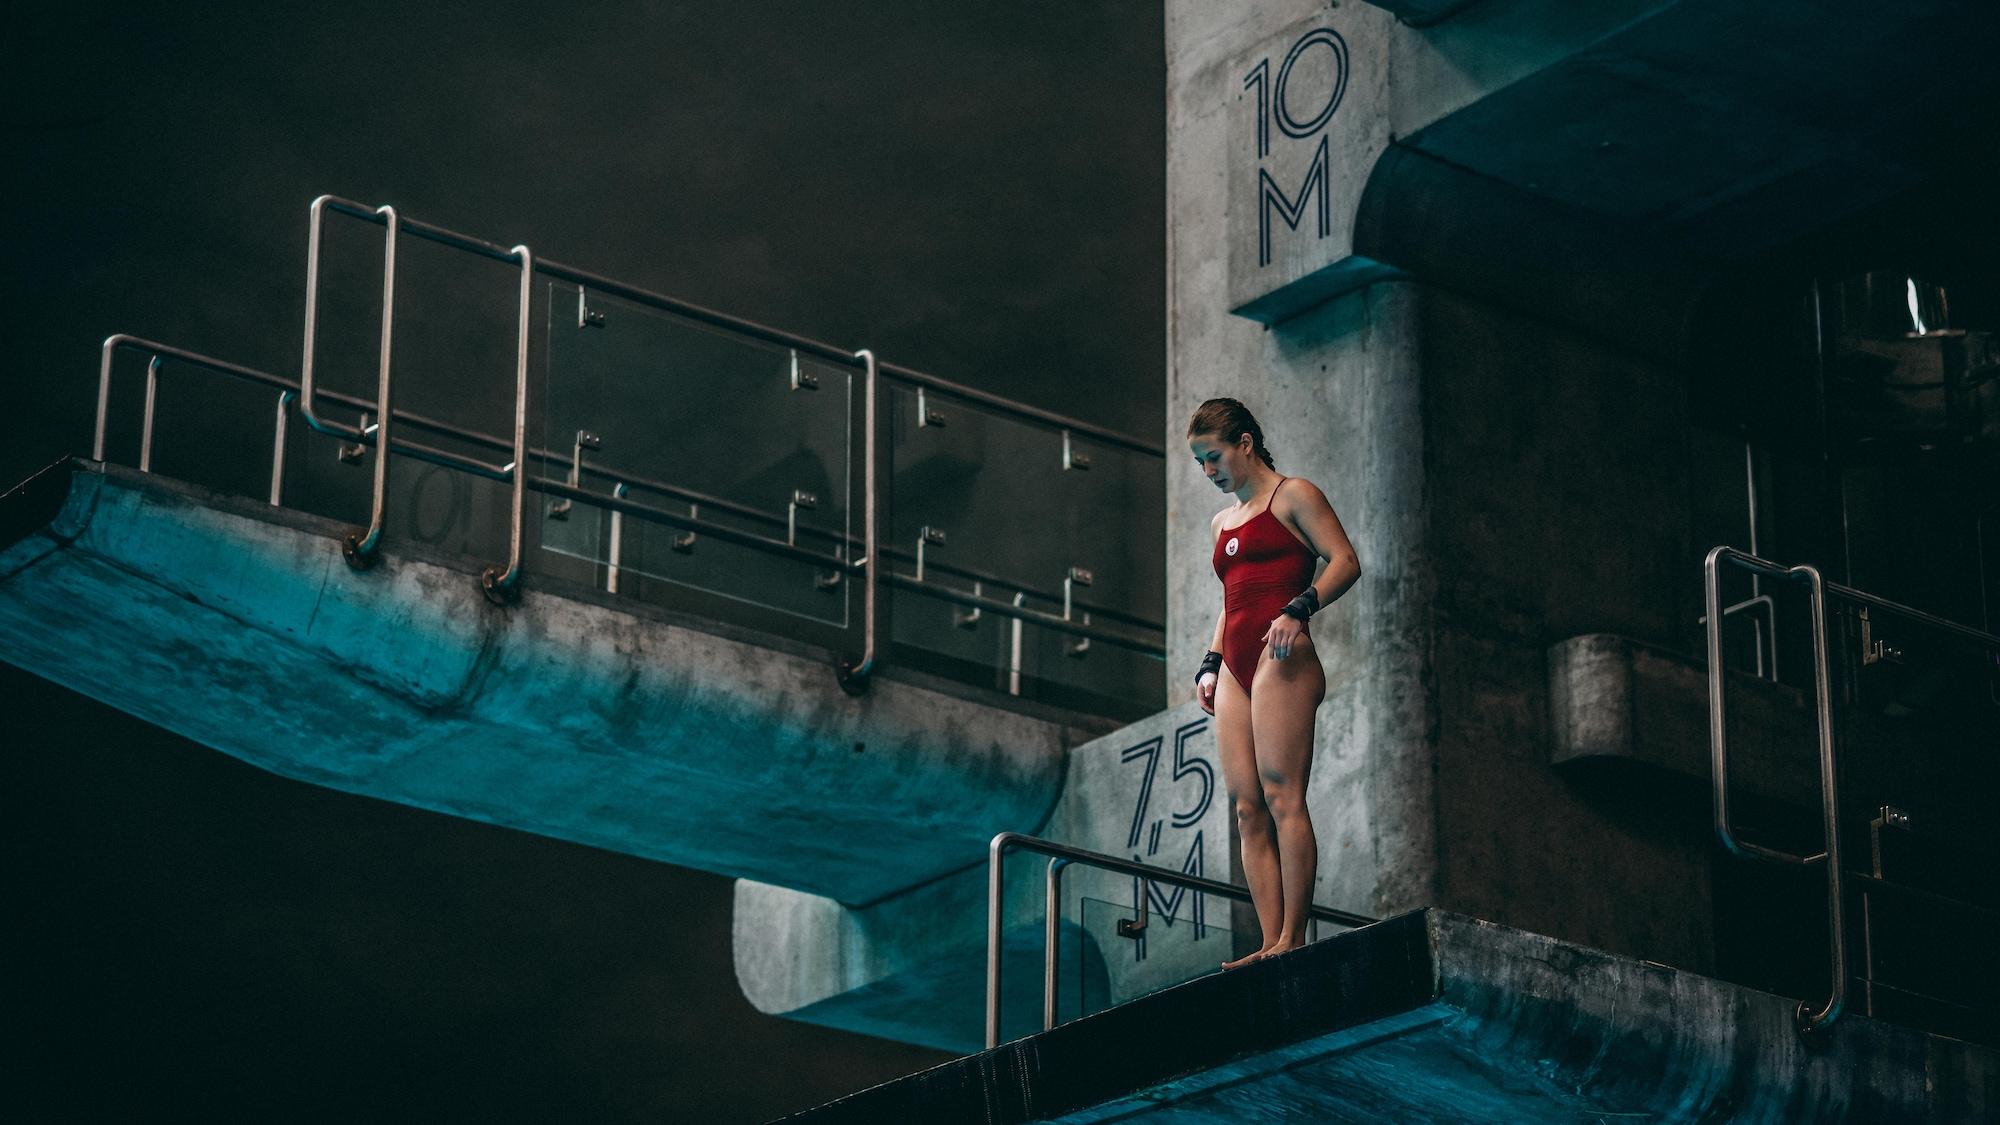 Postée sur la tour de 10 mètres, la plongeuse Caeli McKay regarde en bas en direction du bassin.